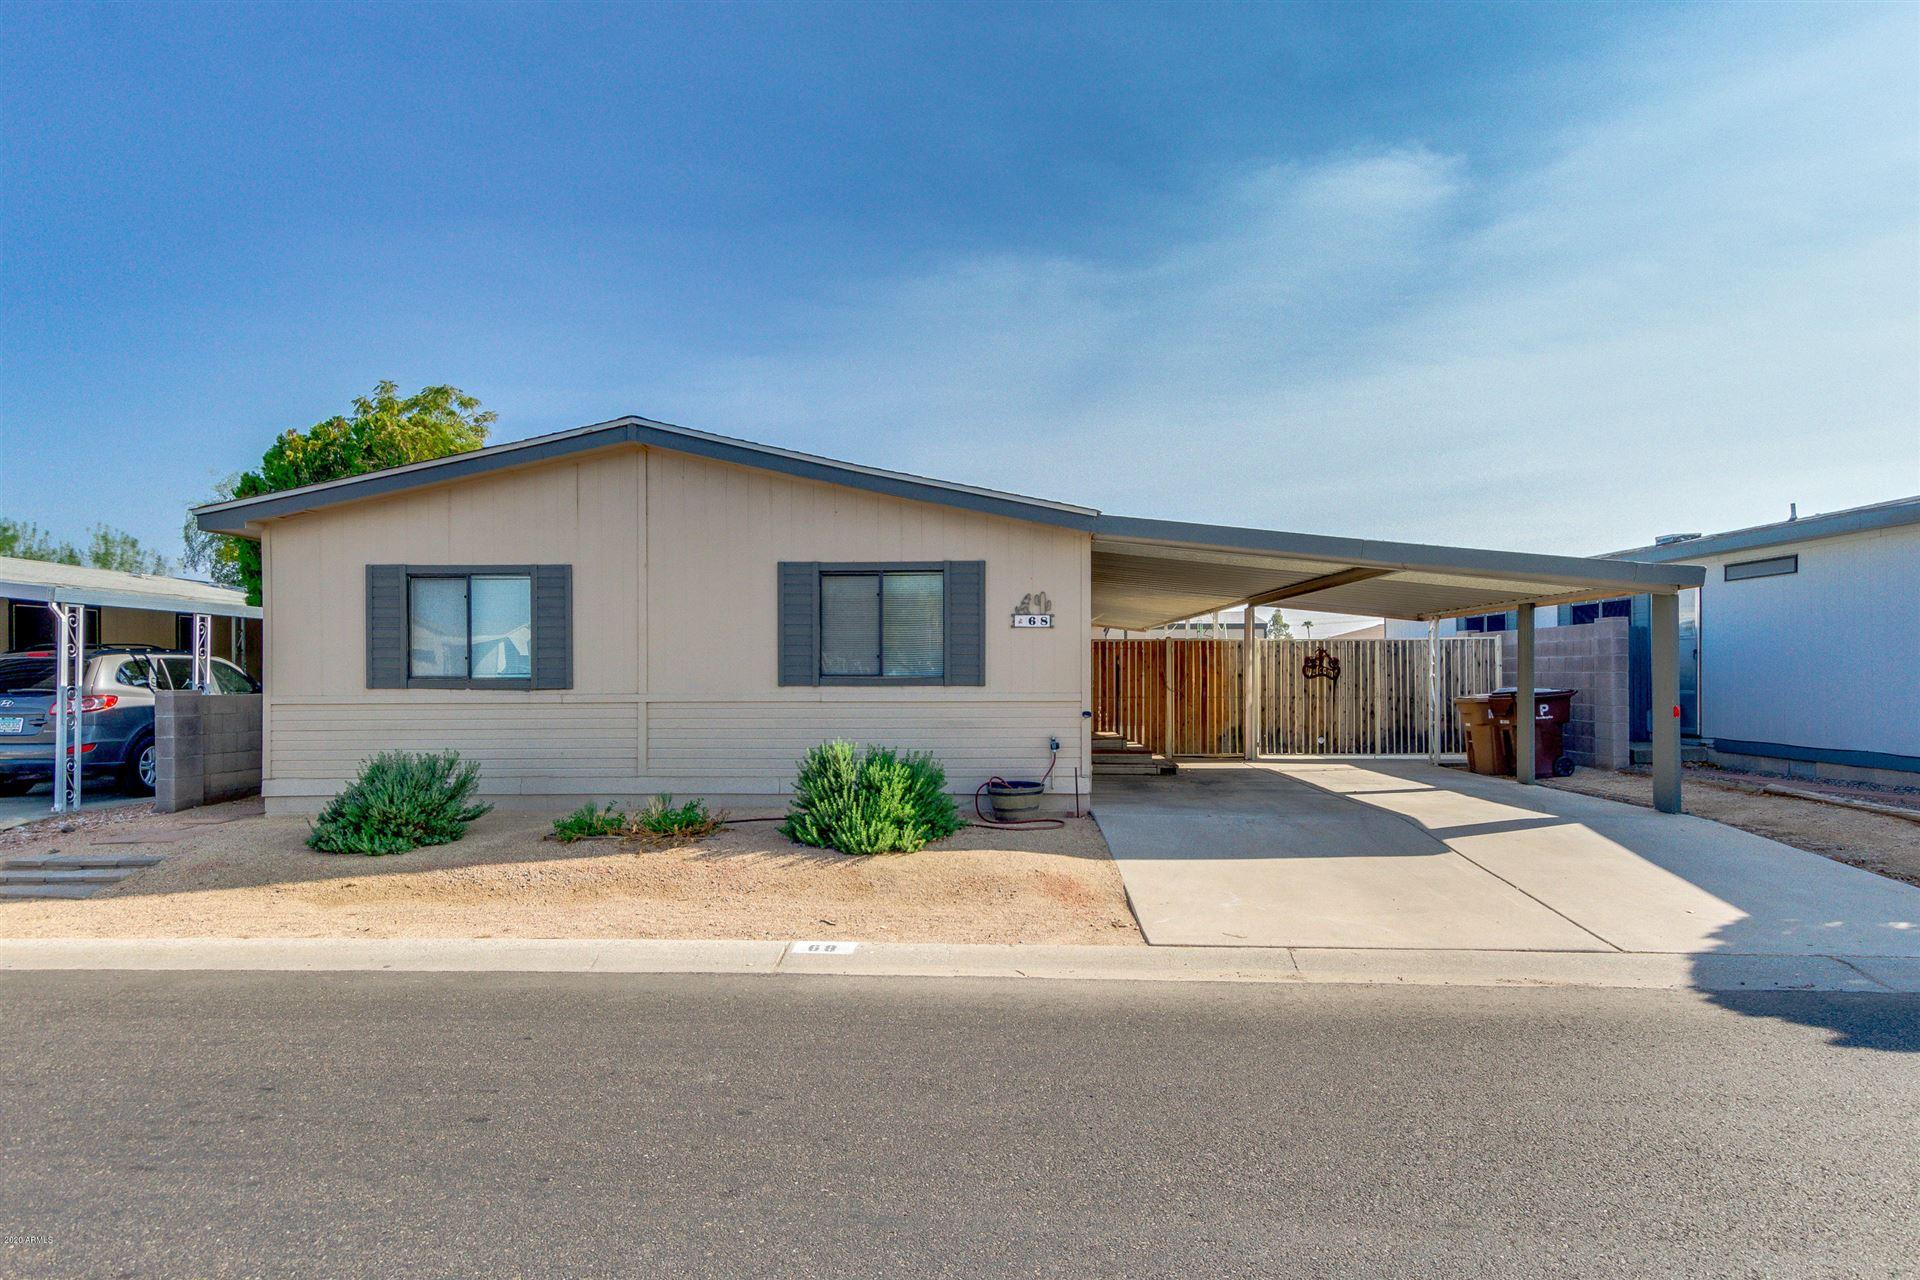 8601 N 103RD Avenue #68, Peoria, AZ 85345 - MLS#: 6130676